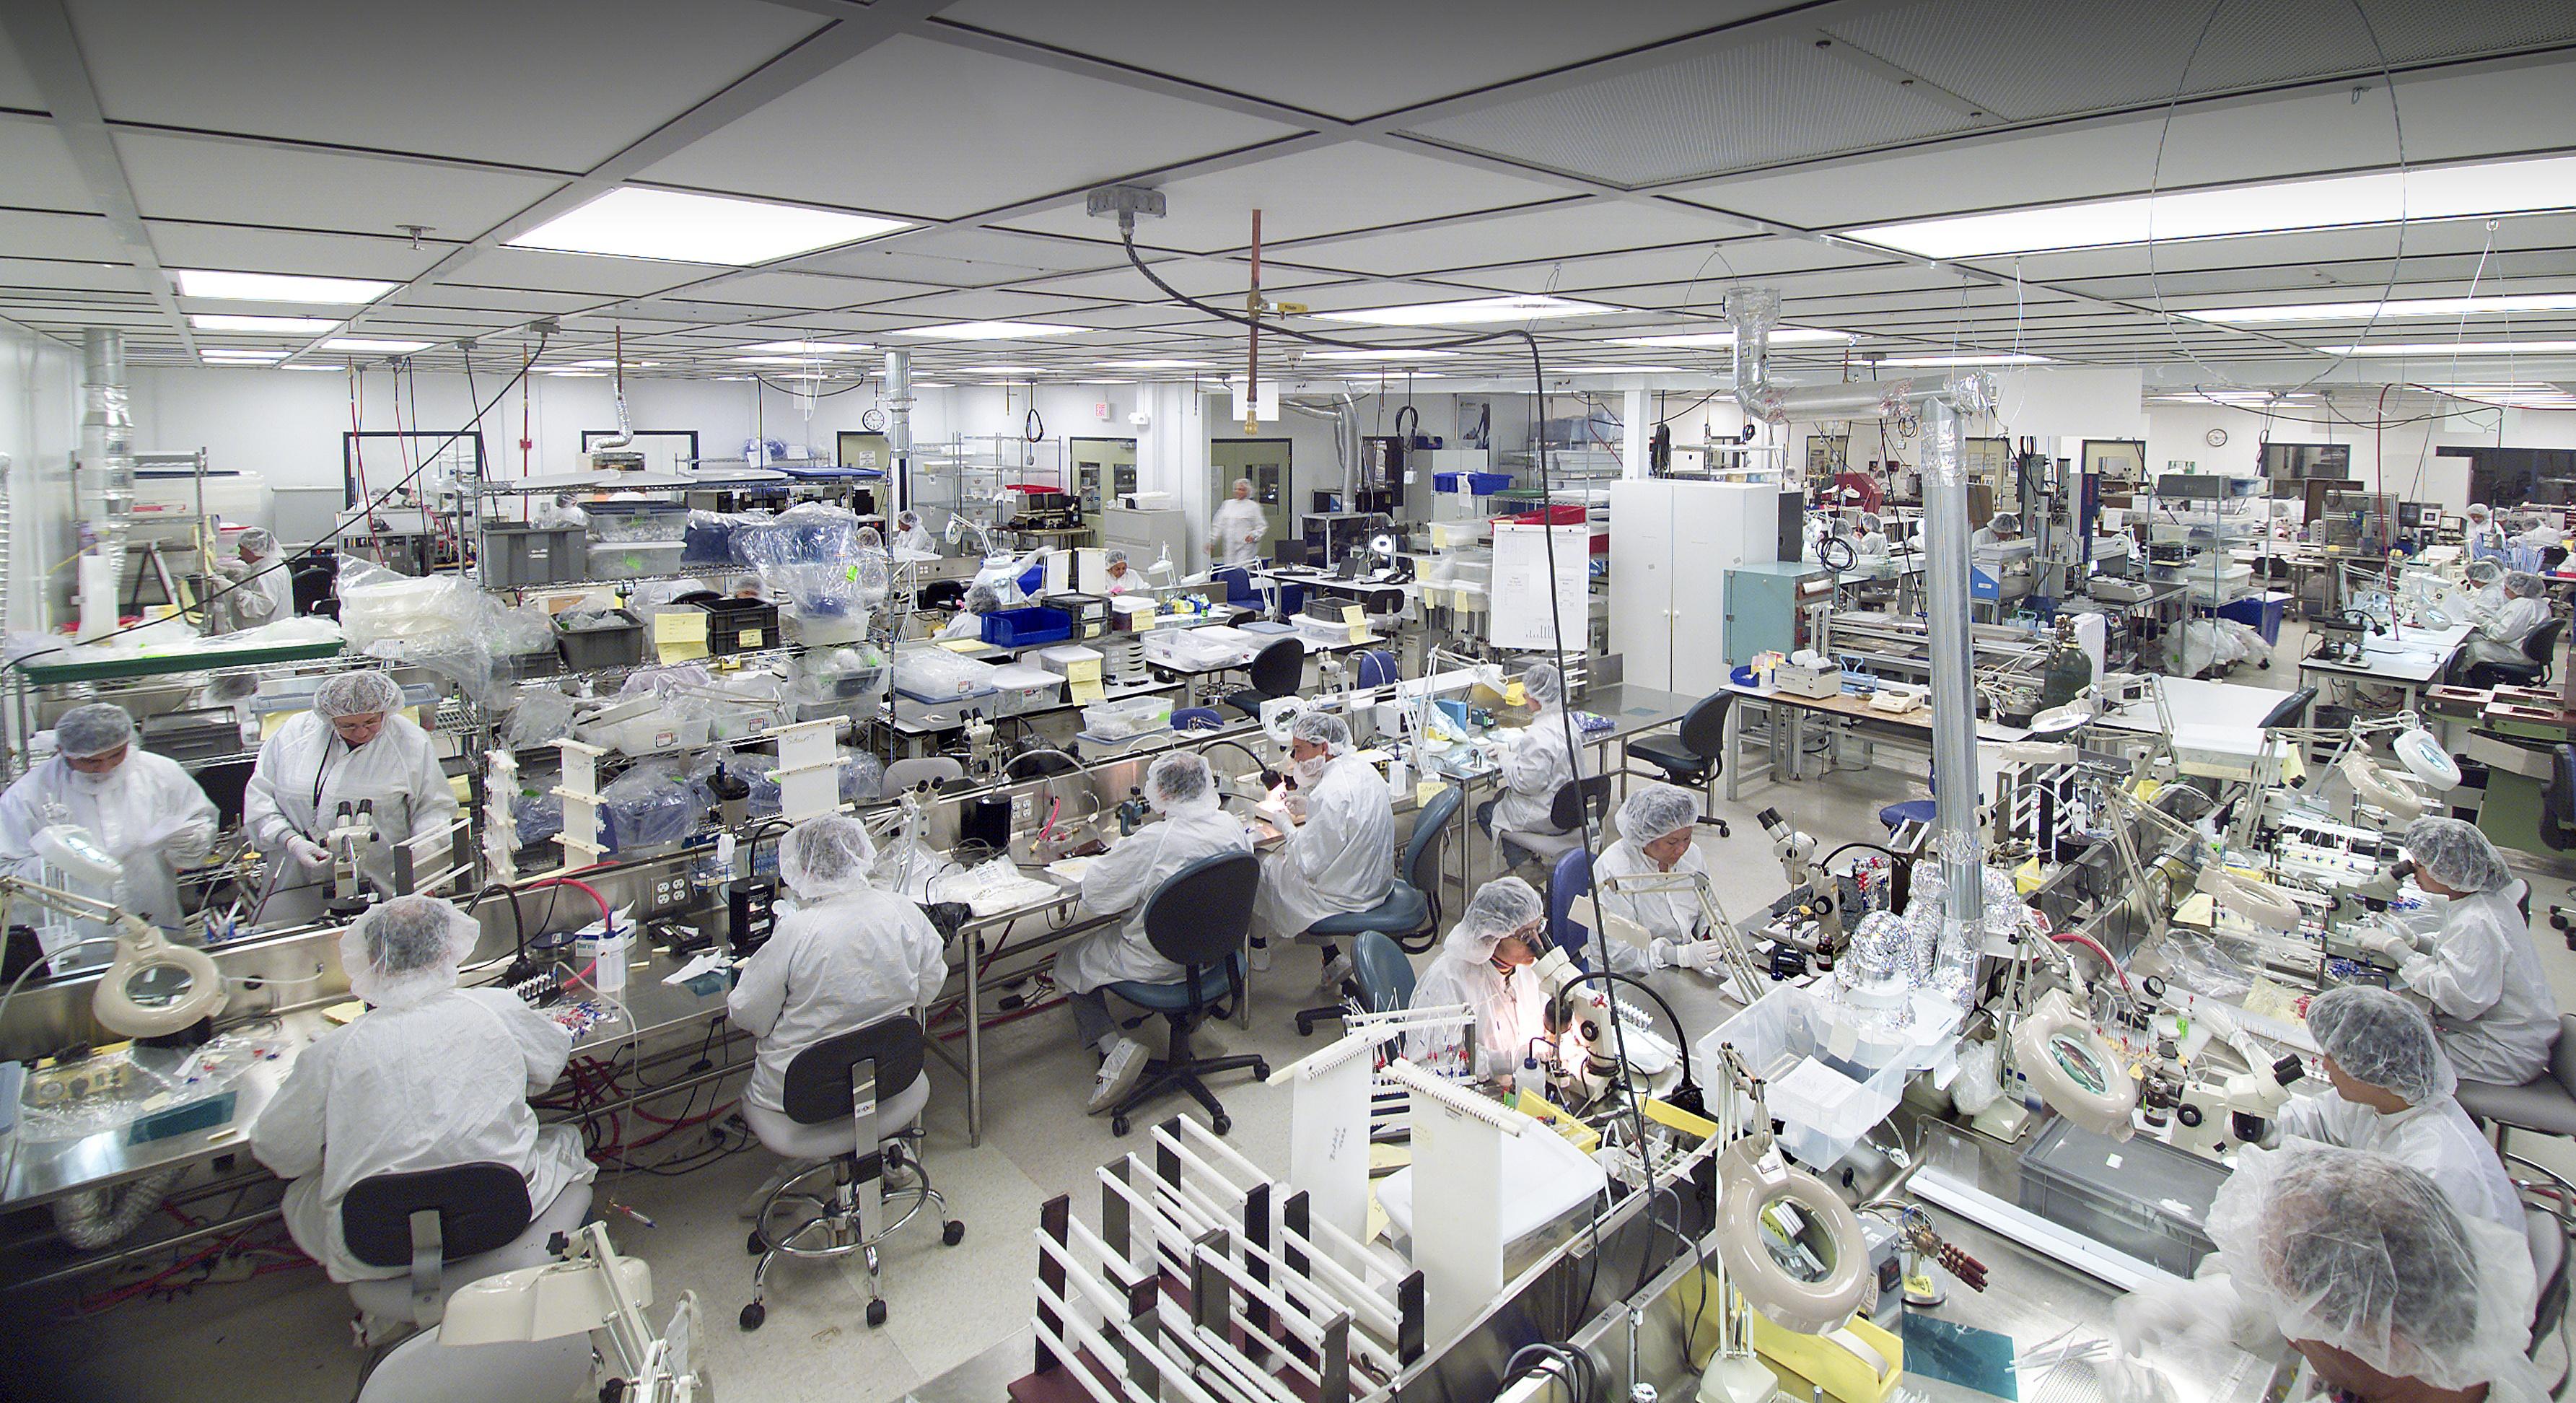 Pressure Sensor Calibration for Cleanrooms